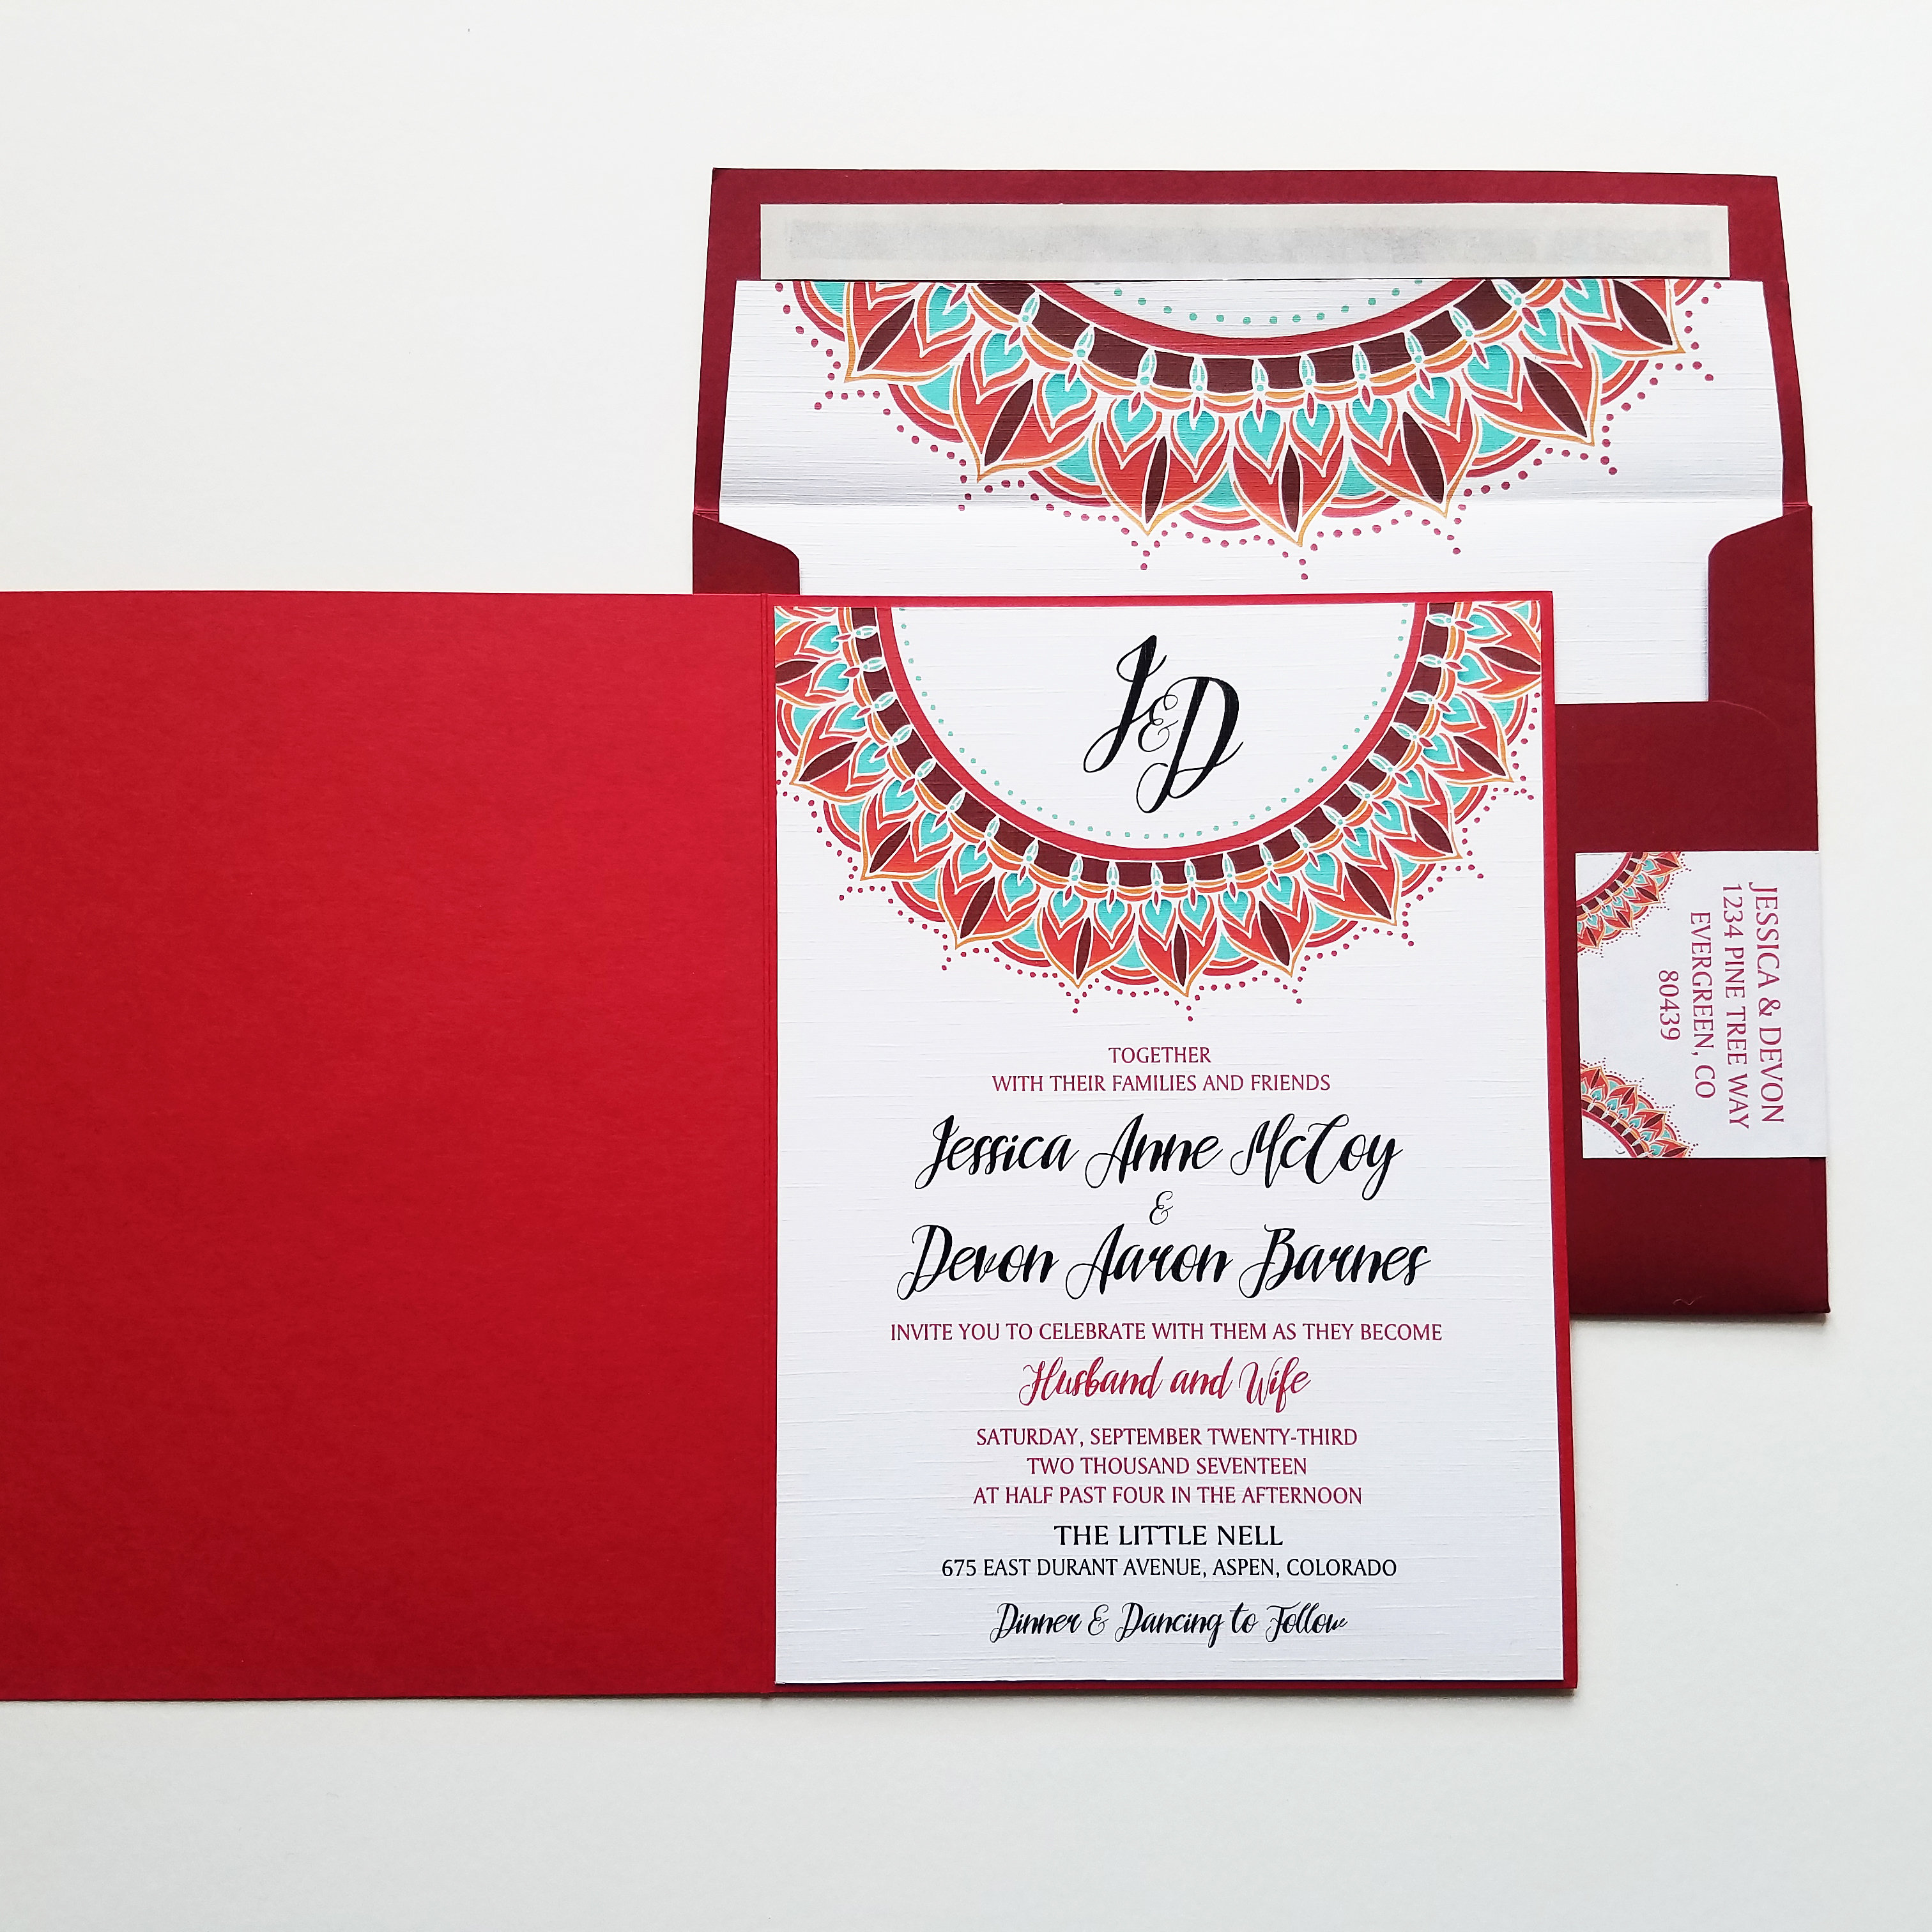 Exelent Wedding Invitation Quotes For Friends Motif - Invitations ...